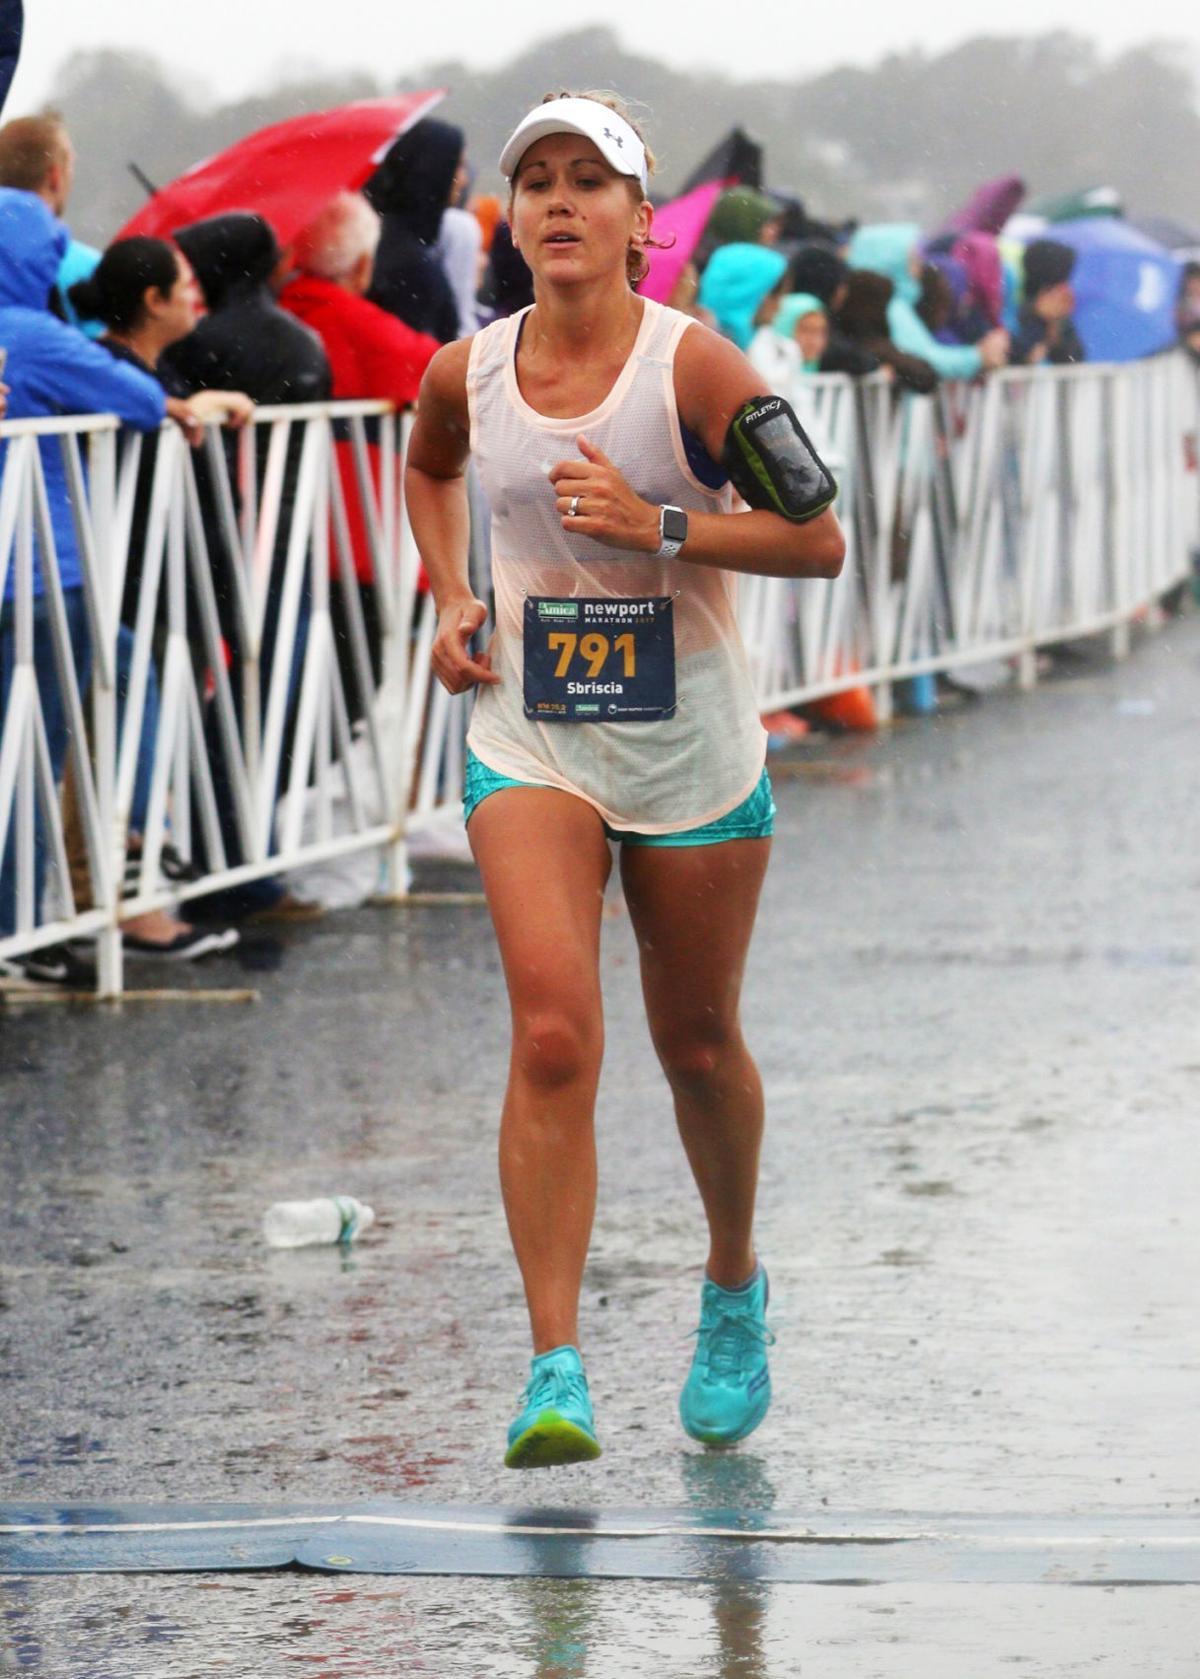 Elysburg native to run in Boston Marathon, raise money for Children's Advocacy Center